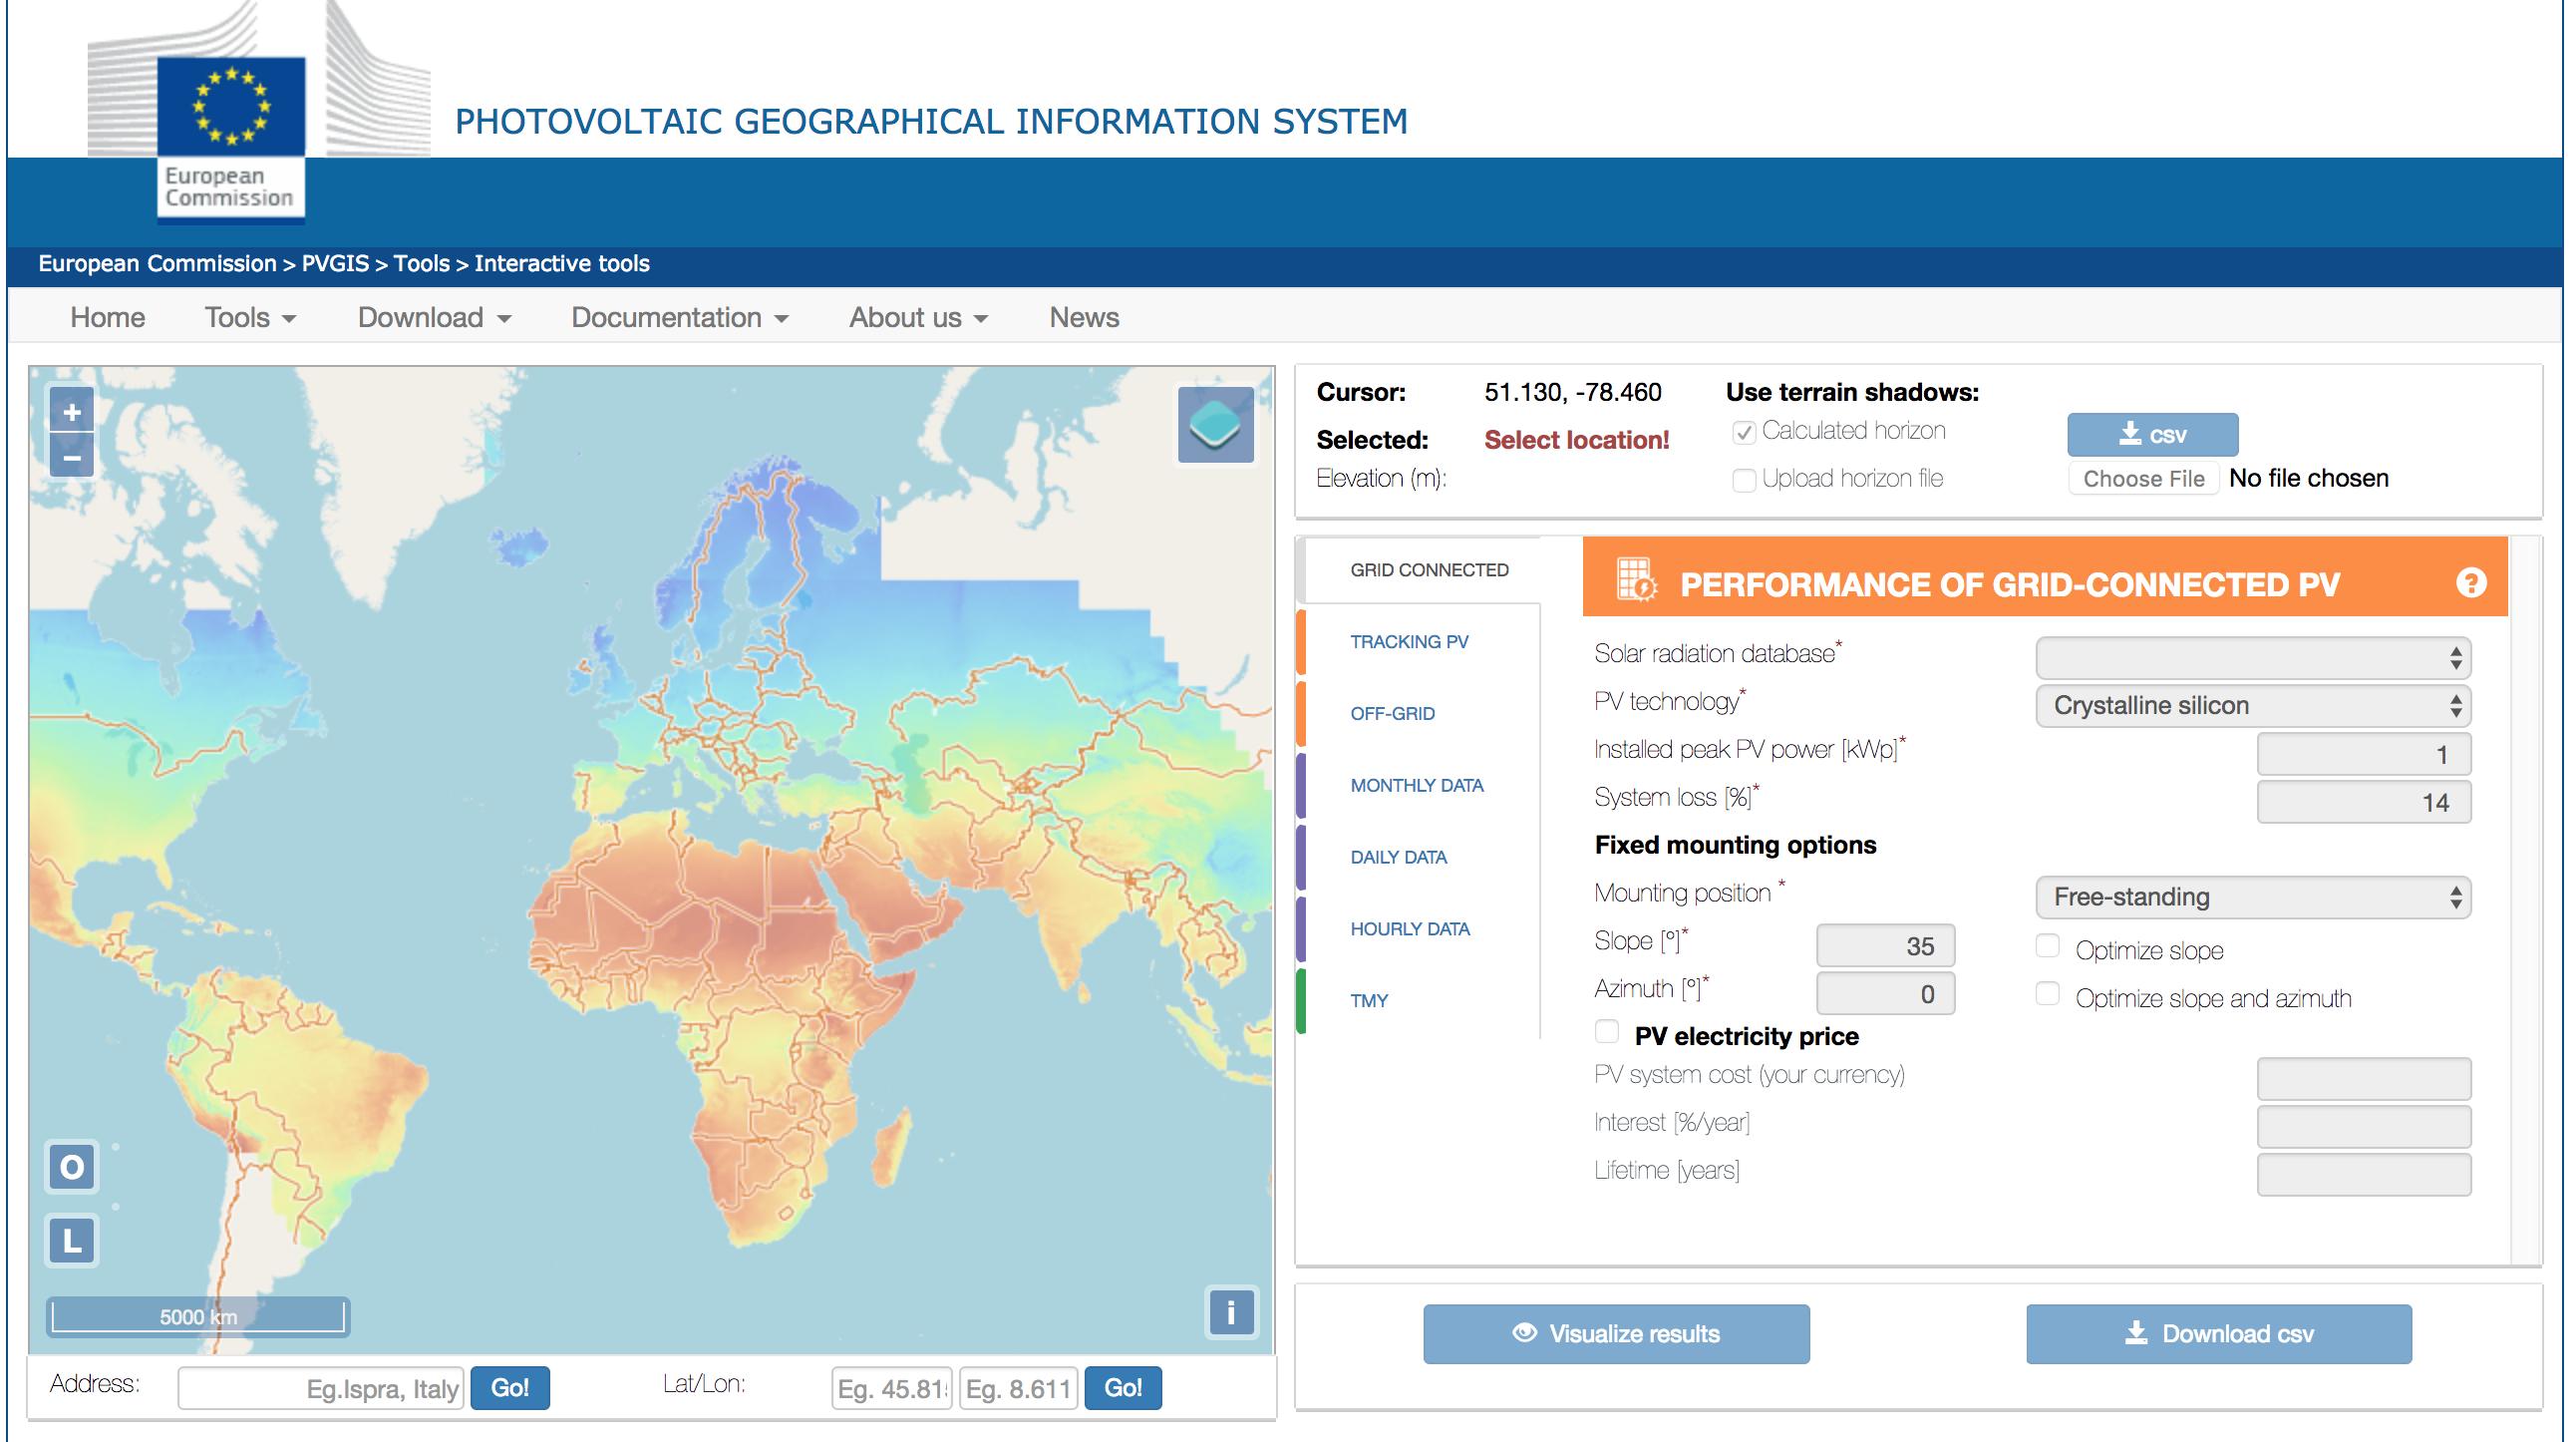 Uploading International Weather Files from PVGIS - HelioScope